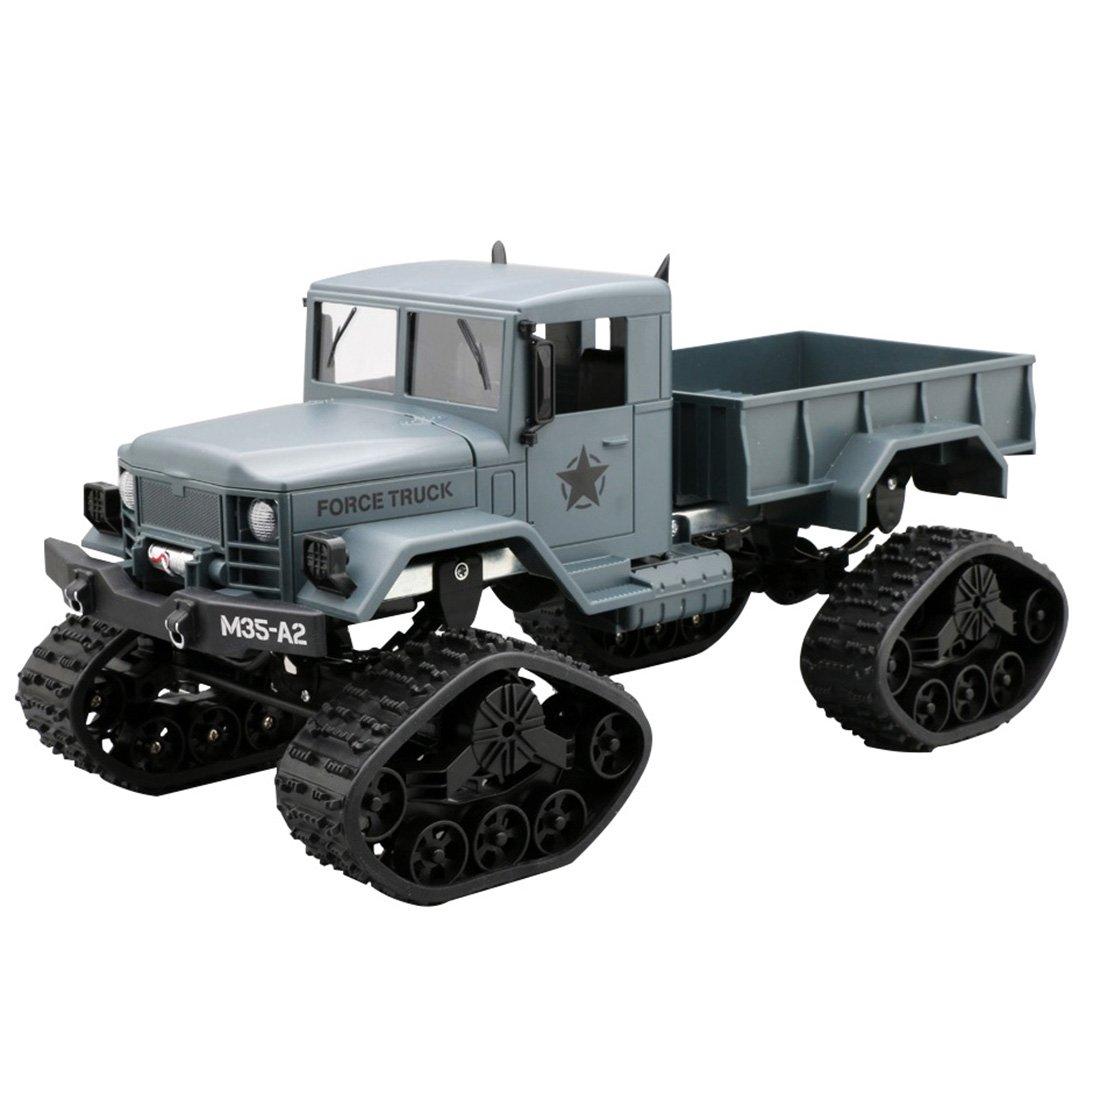 YAHAMA LKW RC Ferngesteuert 2,4 GHz Militärfahrzeuge RC Fahrzeuge Kinder ab 3